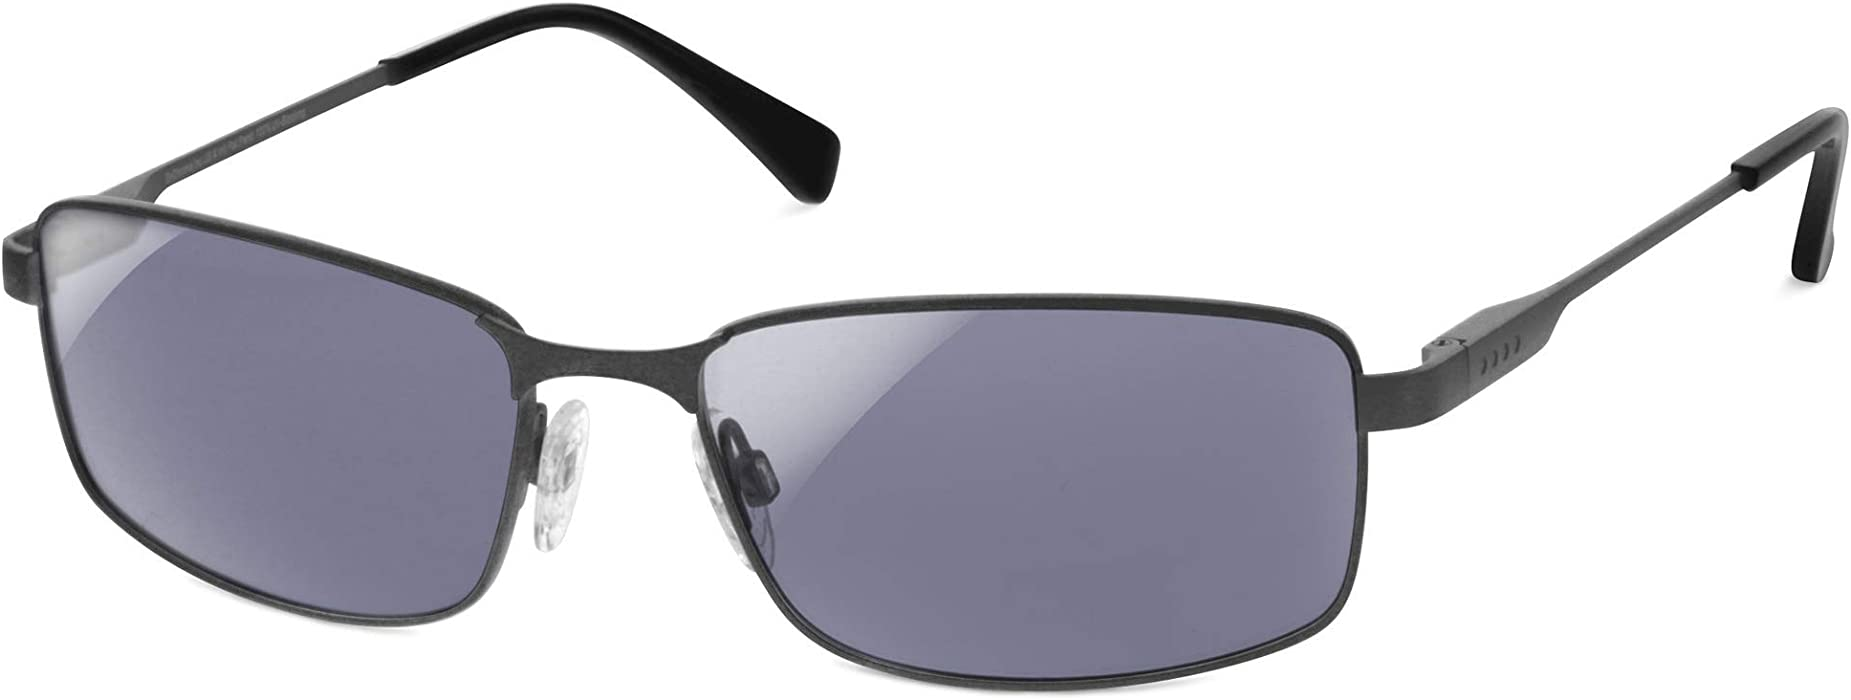 19bcc53efdcf EnChroma Color Blind Glasses - Canyon Gunmetal - Cx3 Sun For Deutan and  Protan Color Blindness